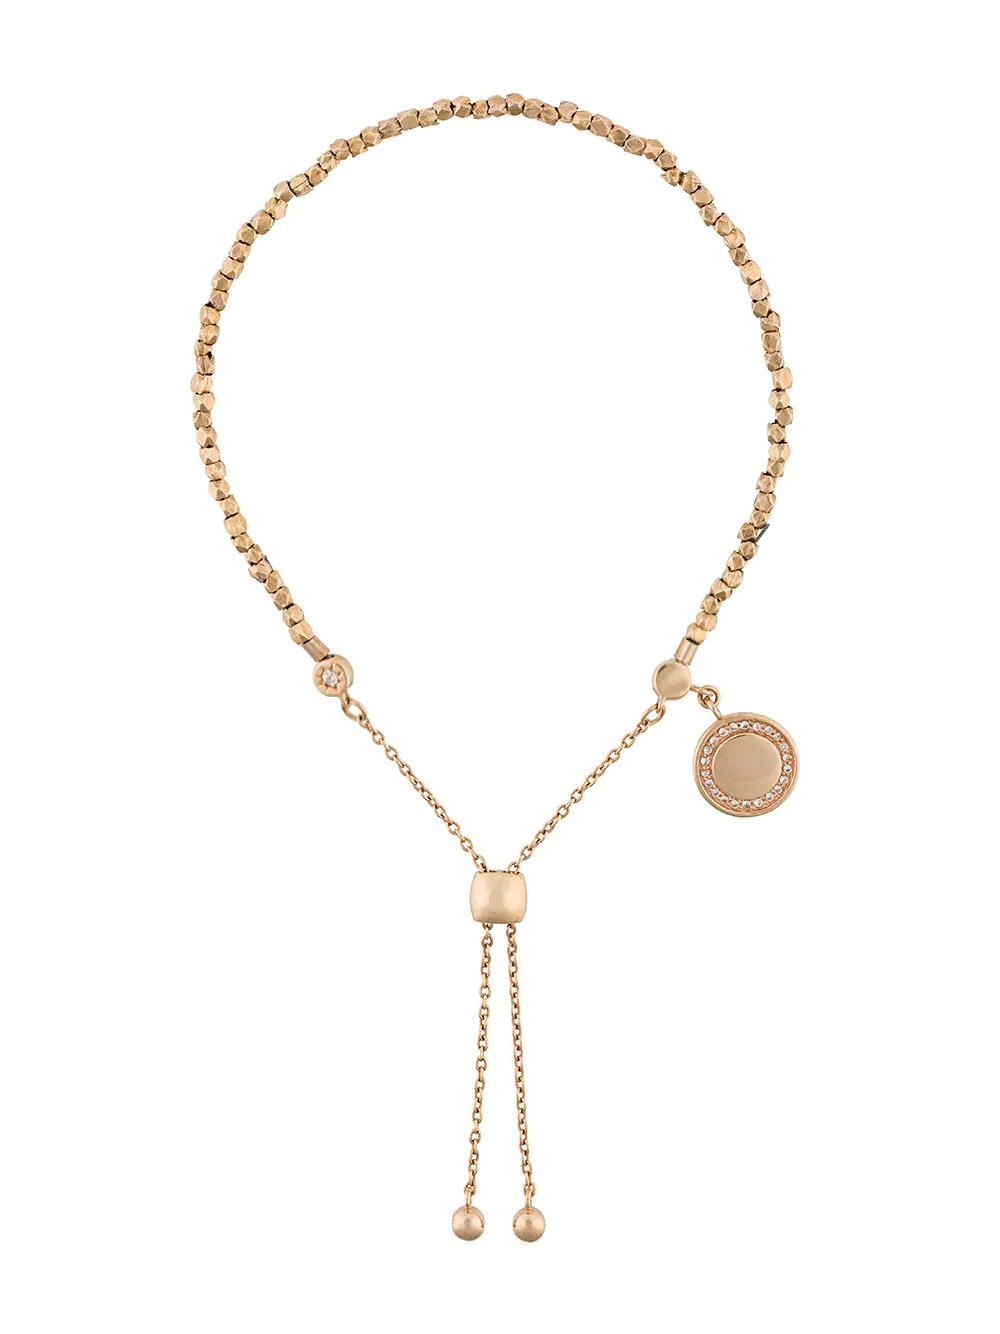 Astley Clarke | Astley Clarke браслет Cosmos Kula | Clouty